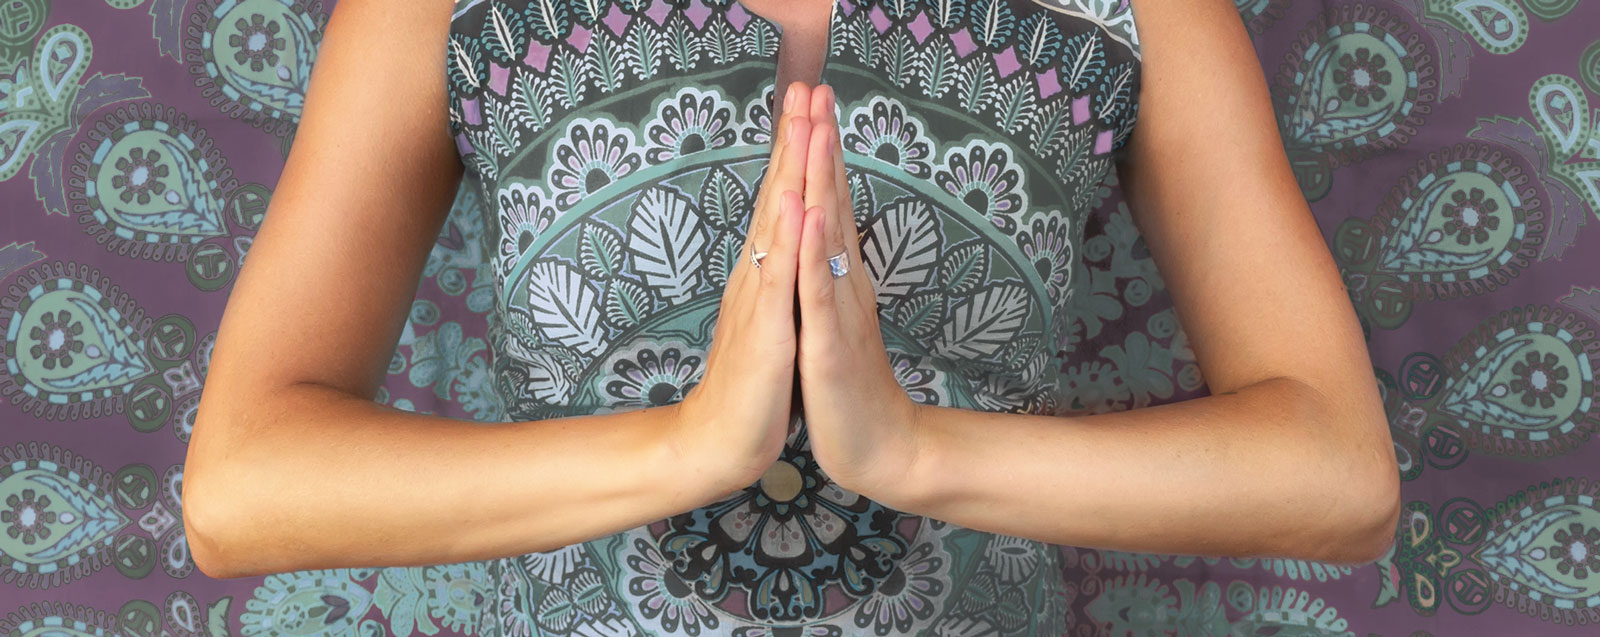 content-referenzen-details-ananda-yoga-header-desktop